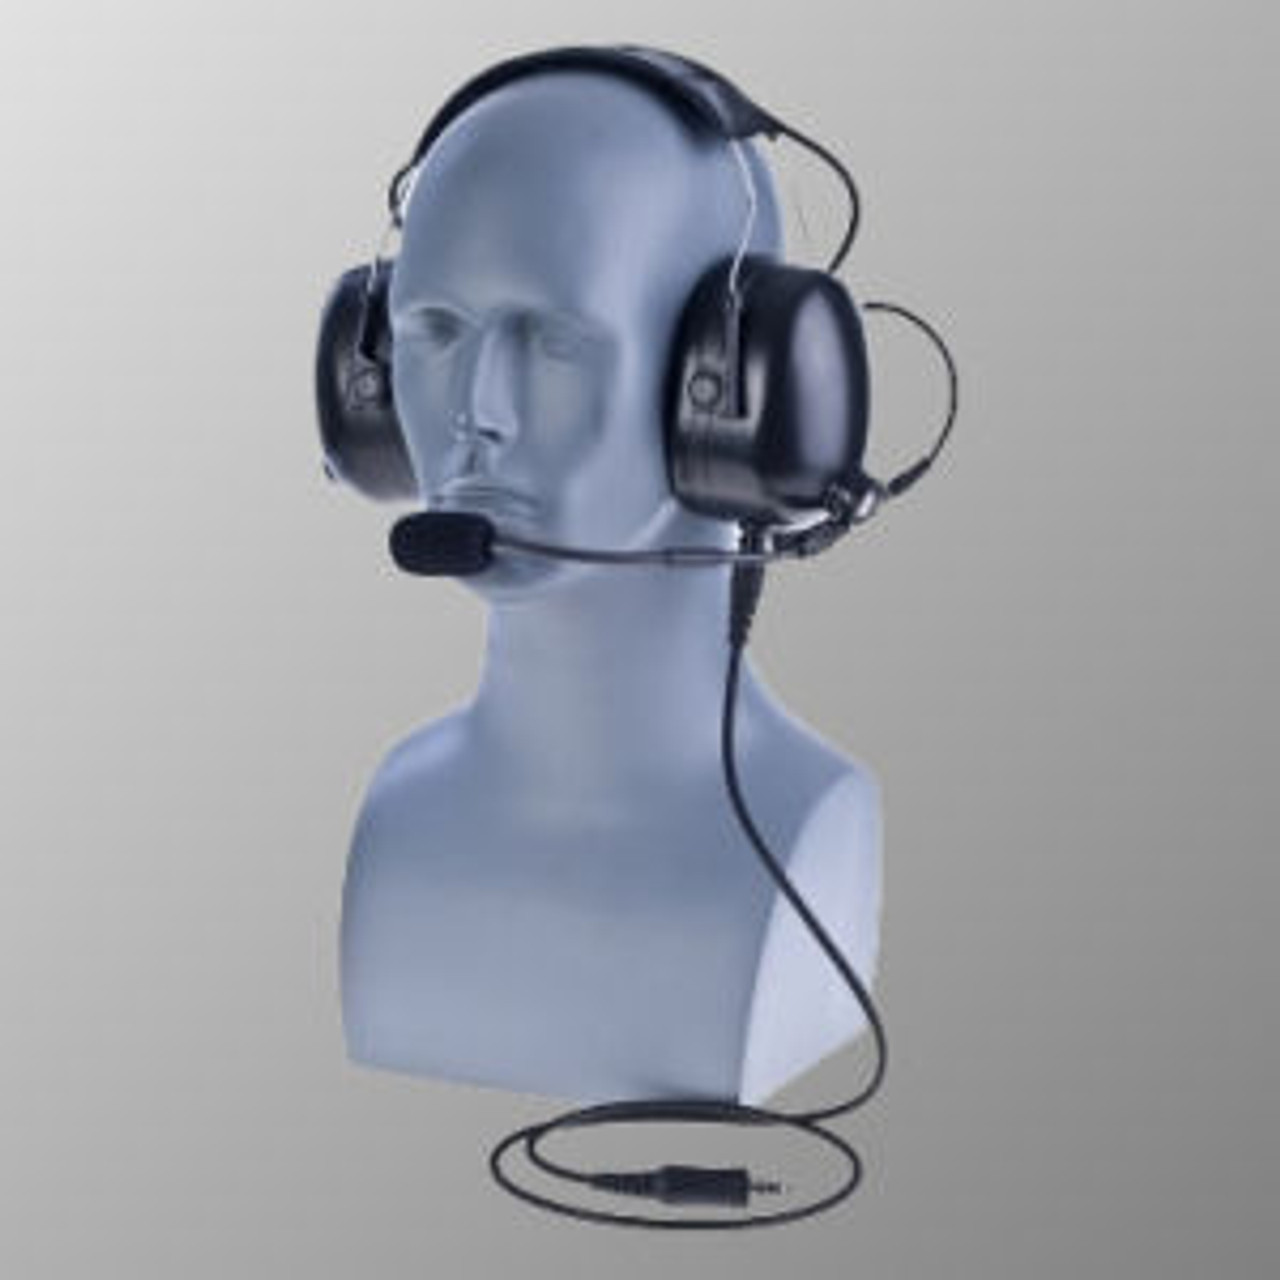 Kenwood NX-3220 Over The Head Double Muff Headset